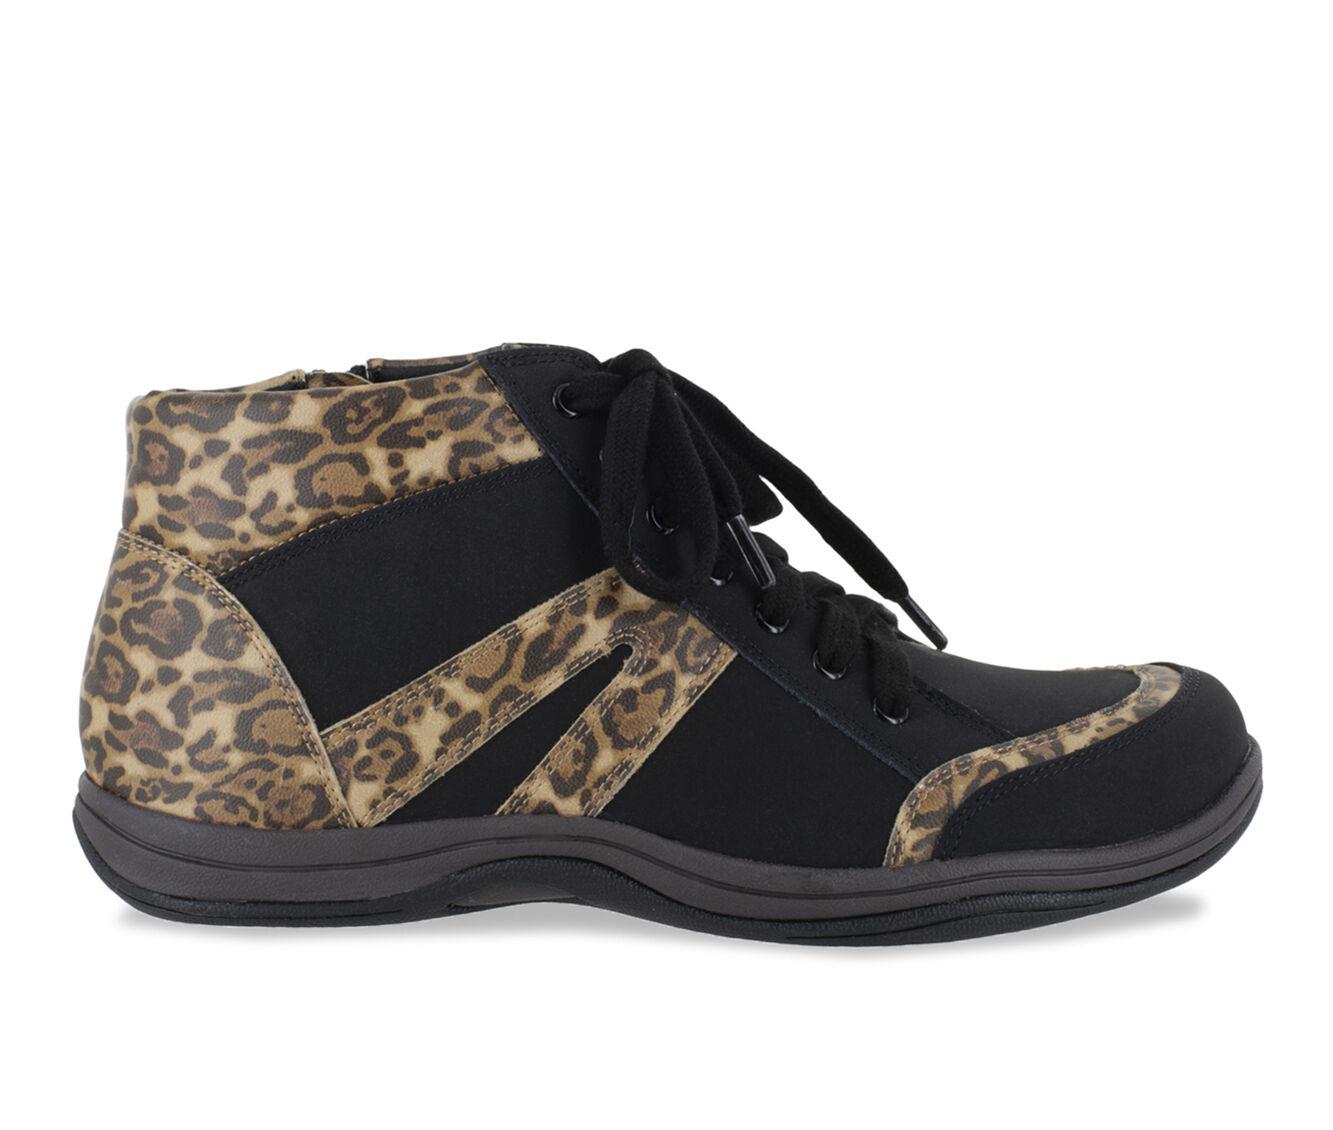 uk shoes_kd4935